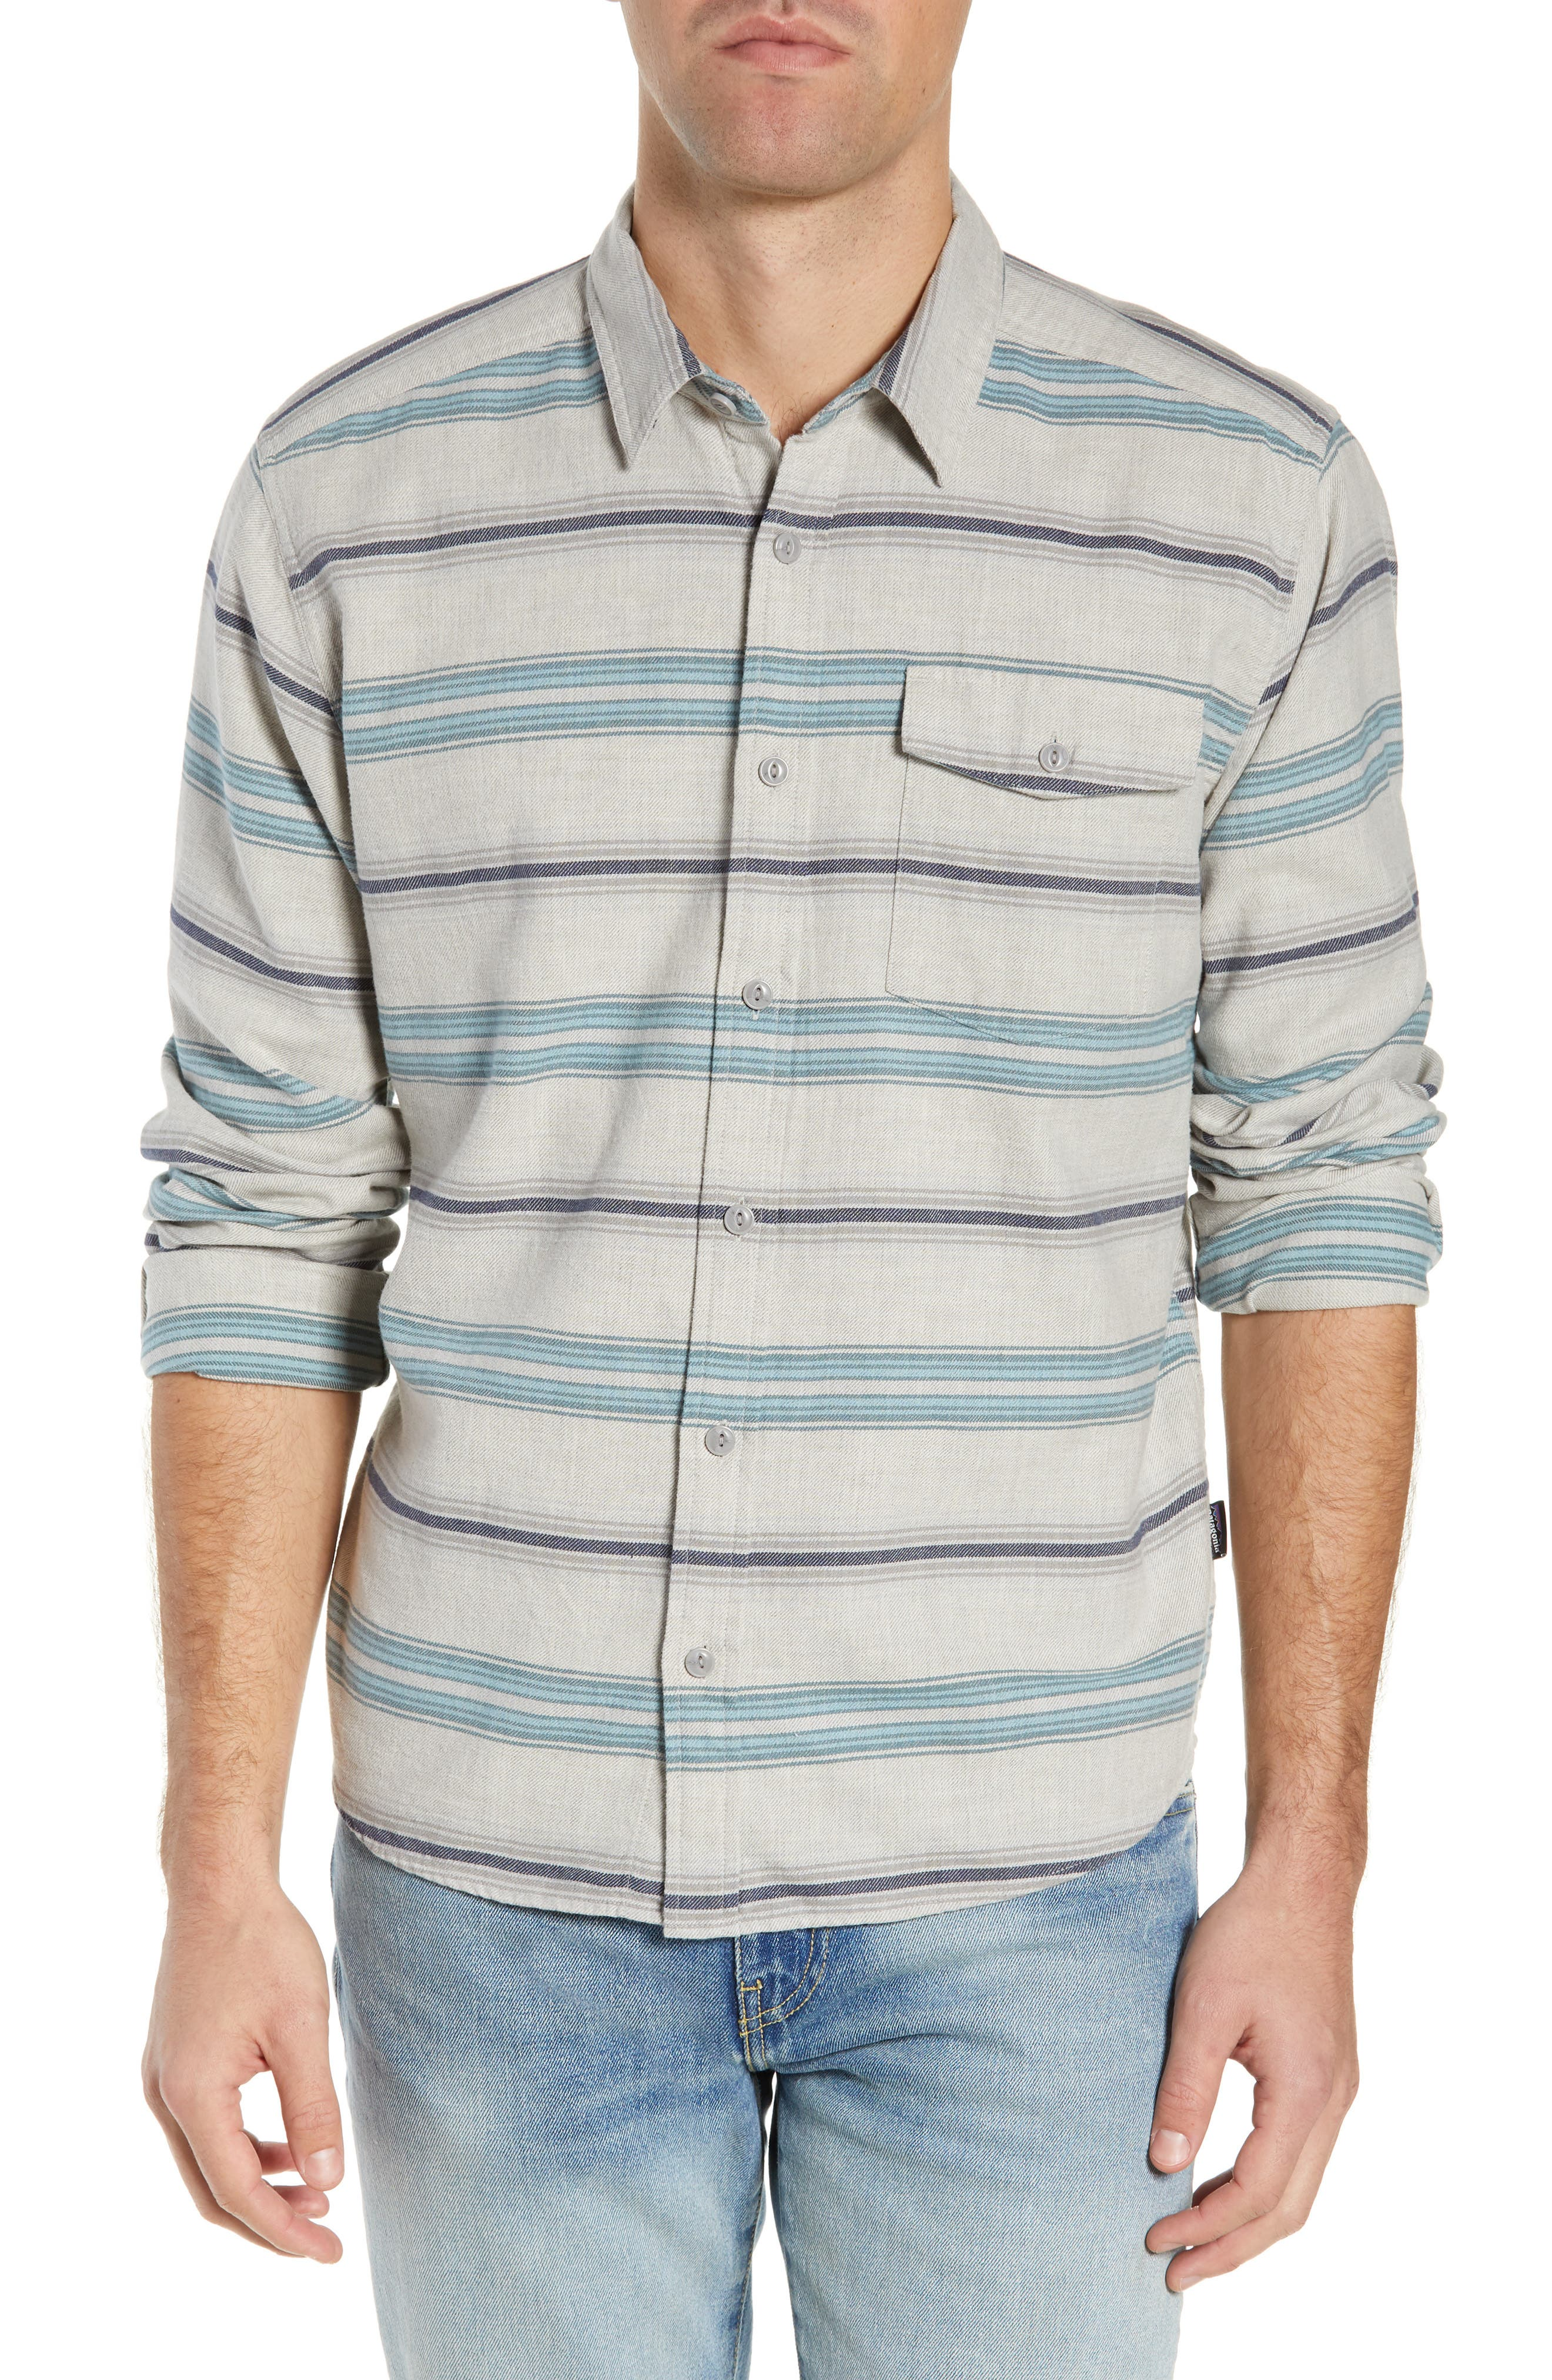 PATAGONIA,                             Regular Fit Organic Cotton Flannel Shirt,                             Main thumbnail 1, color,                             TARKINE STRIPE DRIFTER GREY